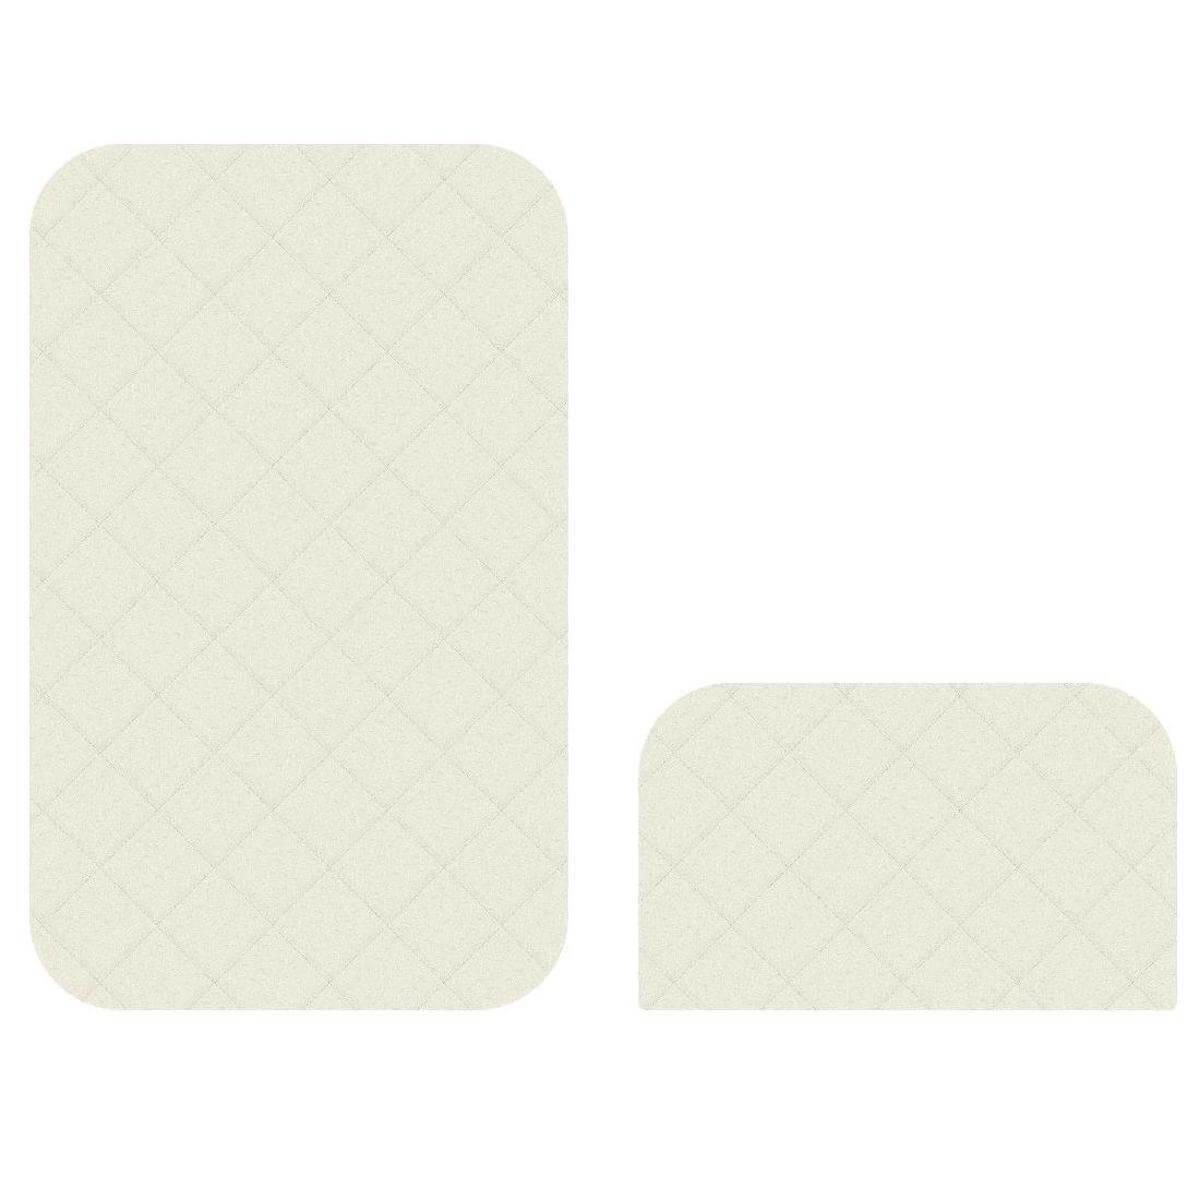 Matratze 70x112,5cm CLASSIC Sebra